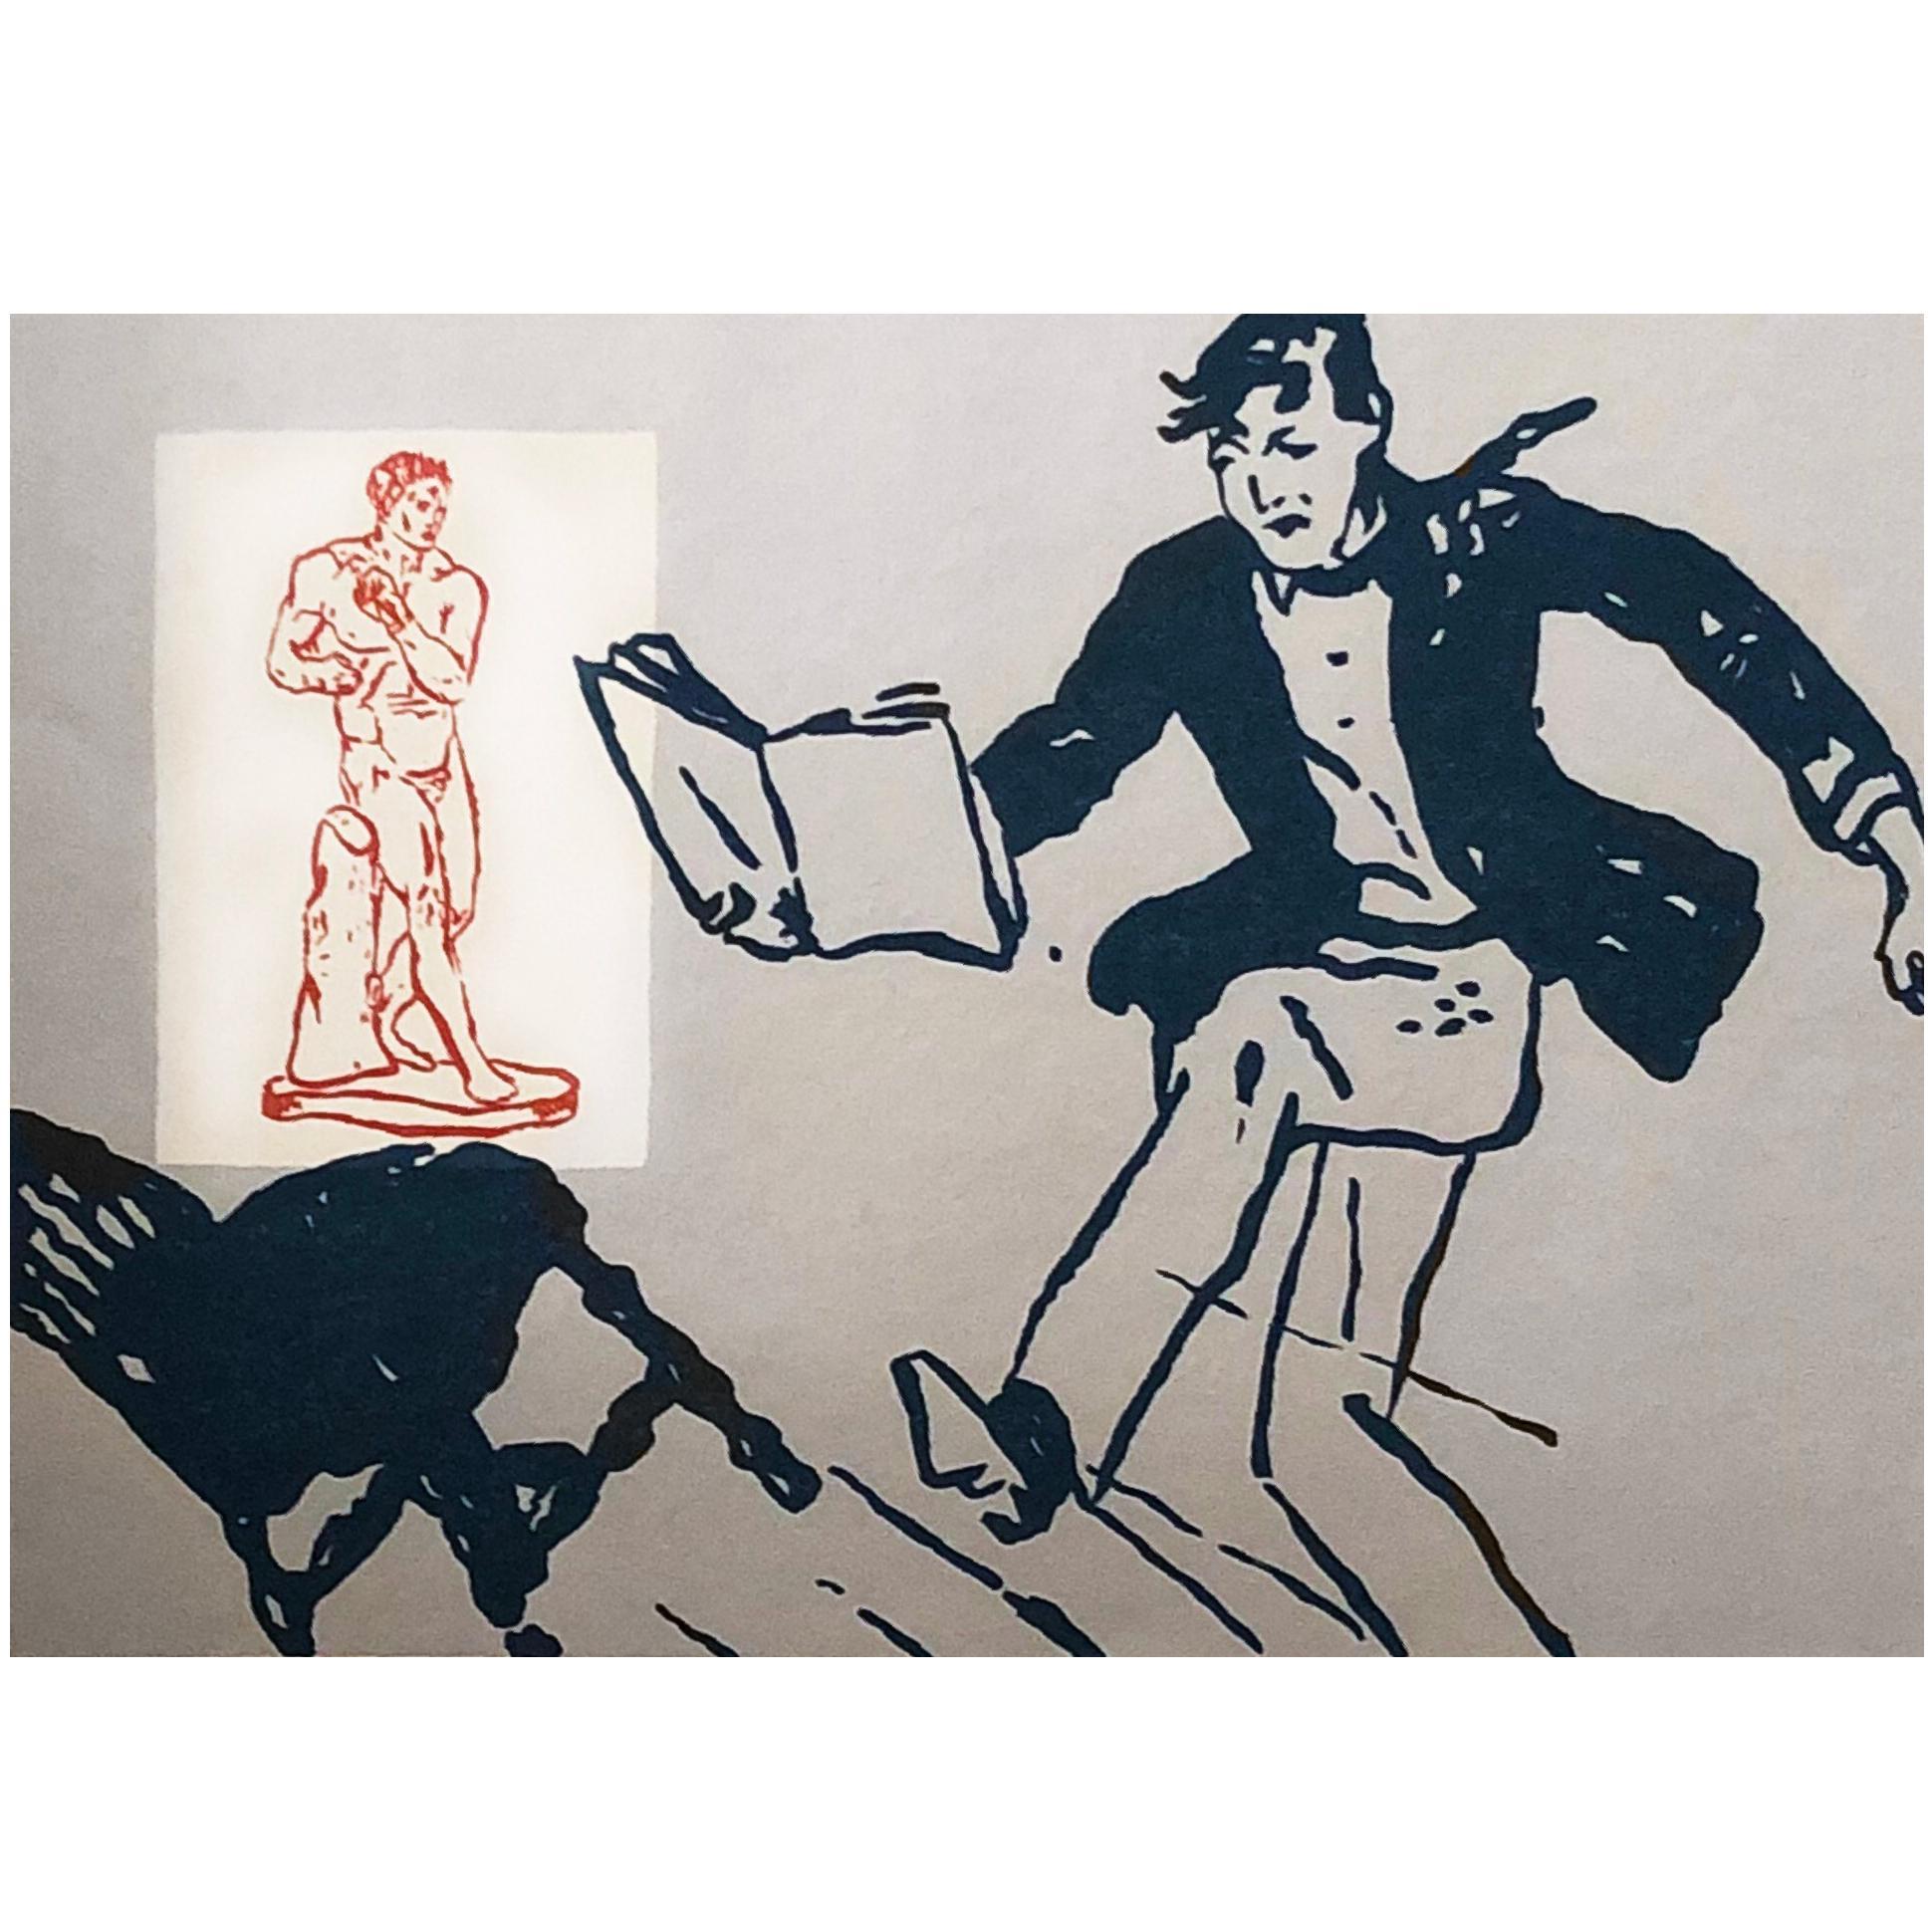 Postmodern Pop Art Silk Screen Painting Print 'Classic Heroes' by David Bromley